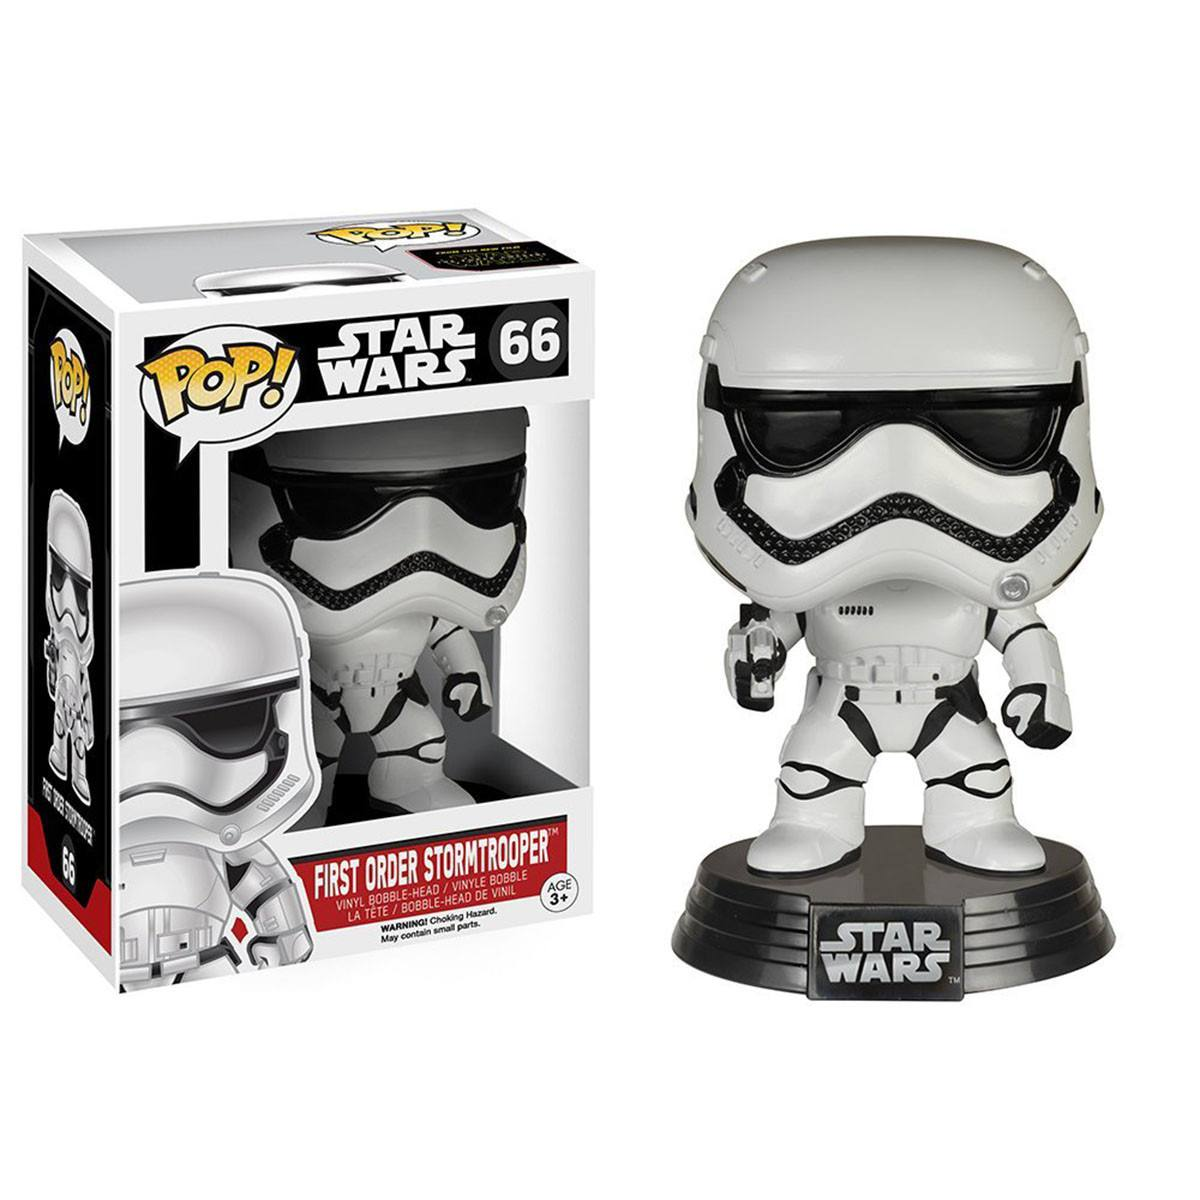 POP! Star Wars - First Order Stormtrooper